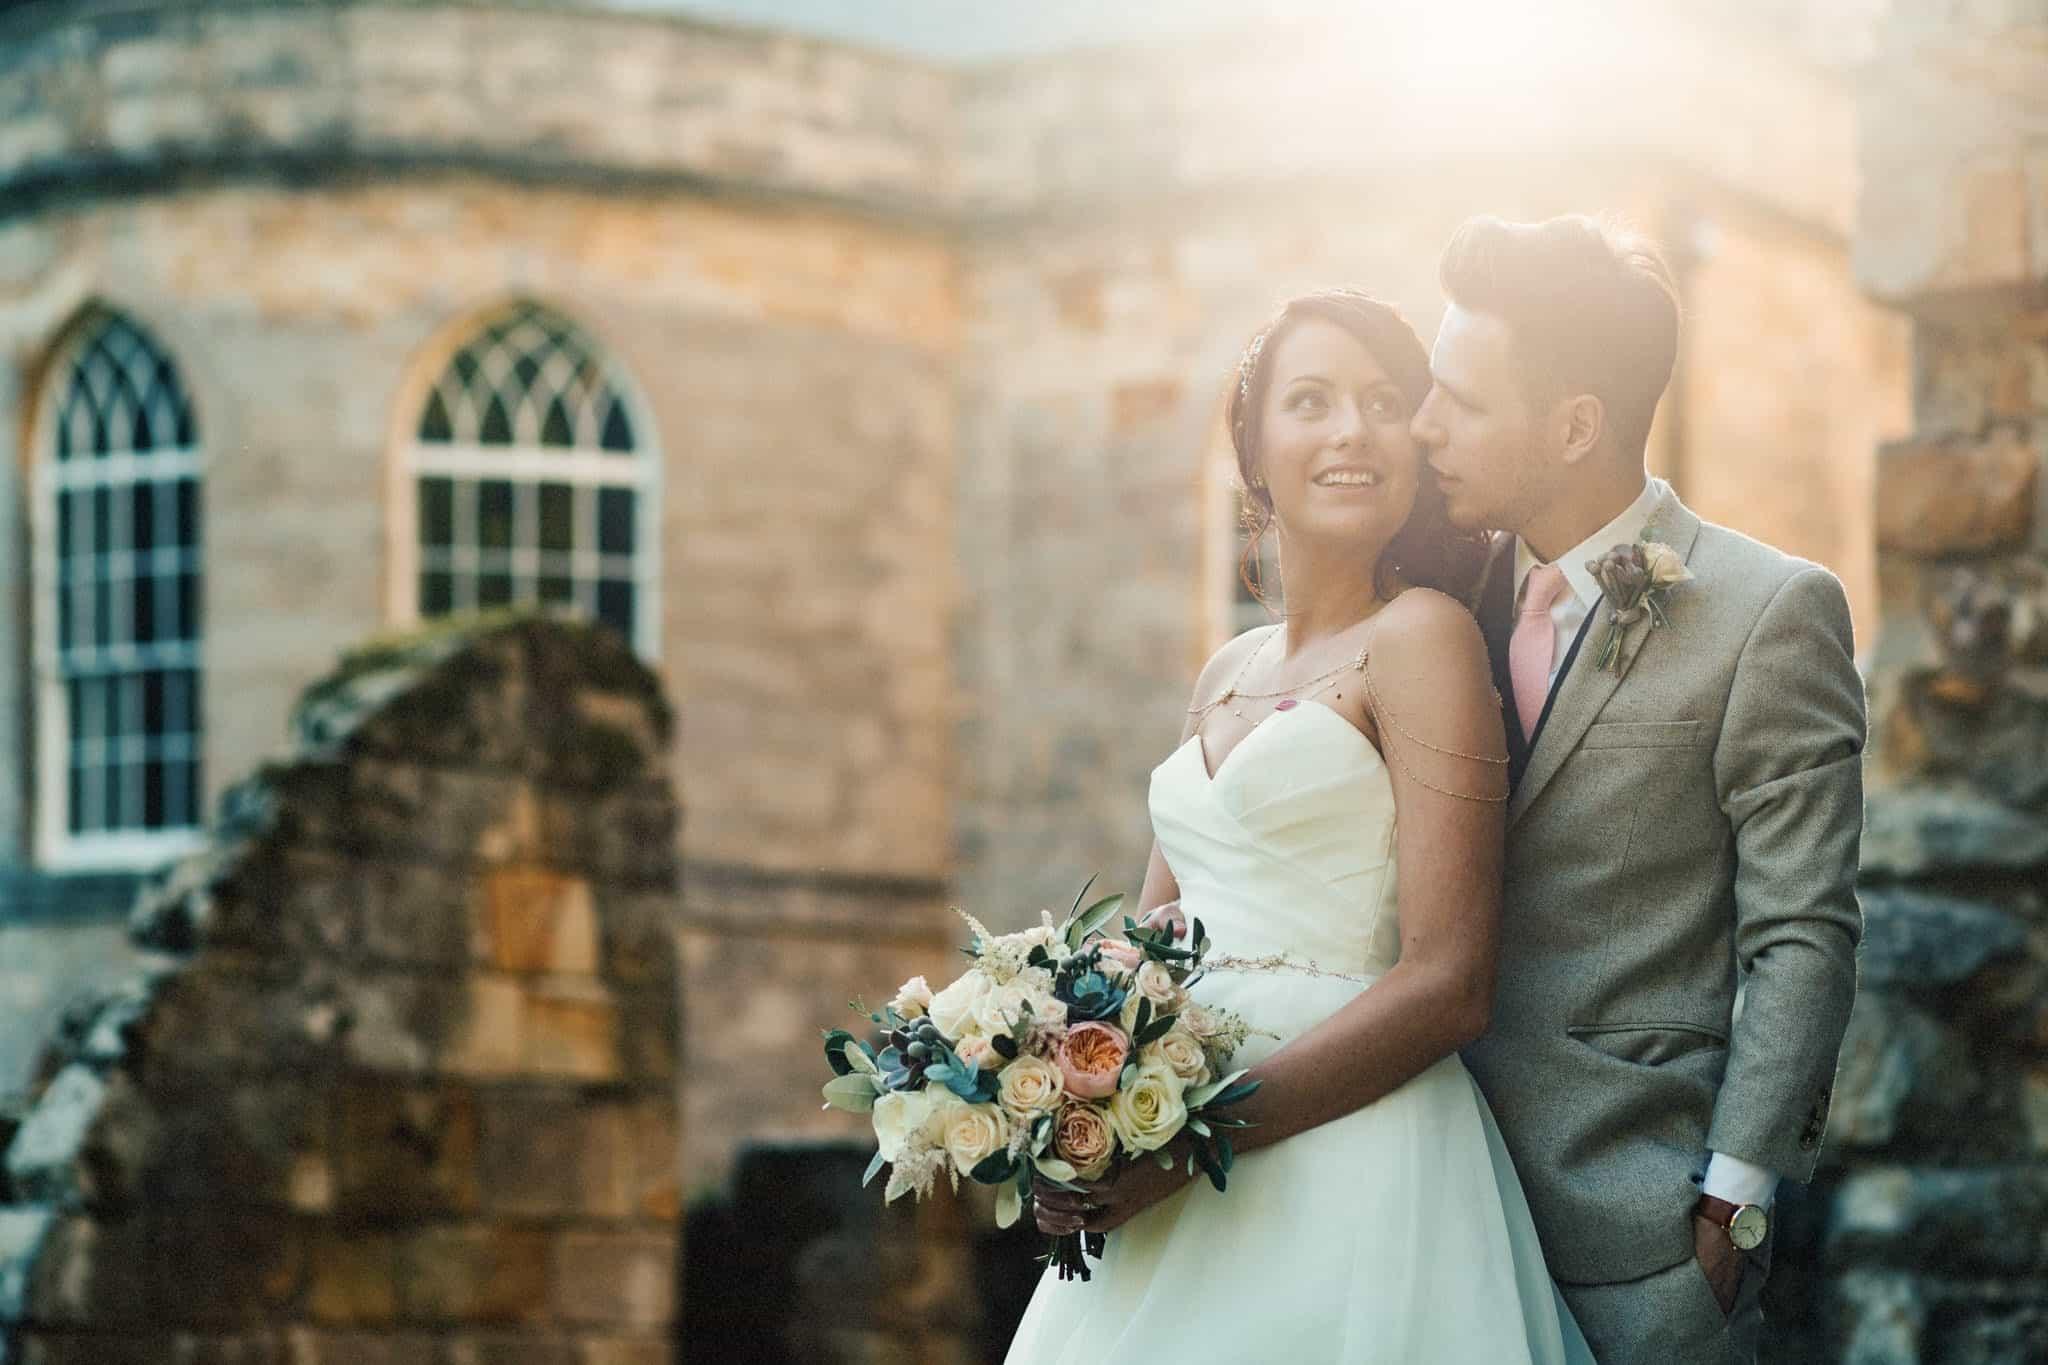 Brinkburn Priory wedding photography | Andy Turner